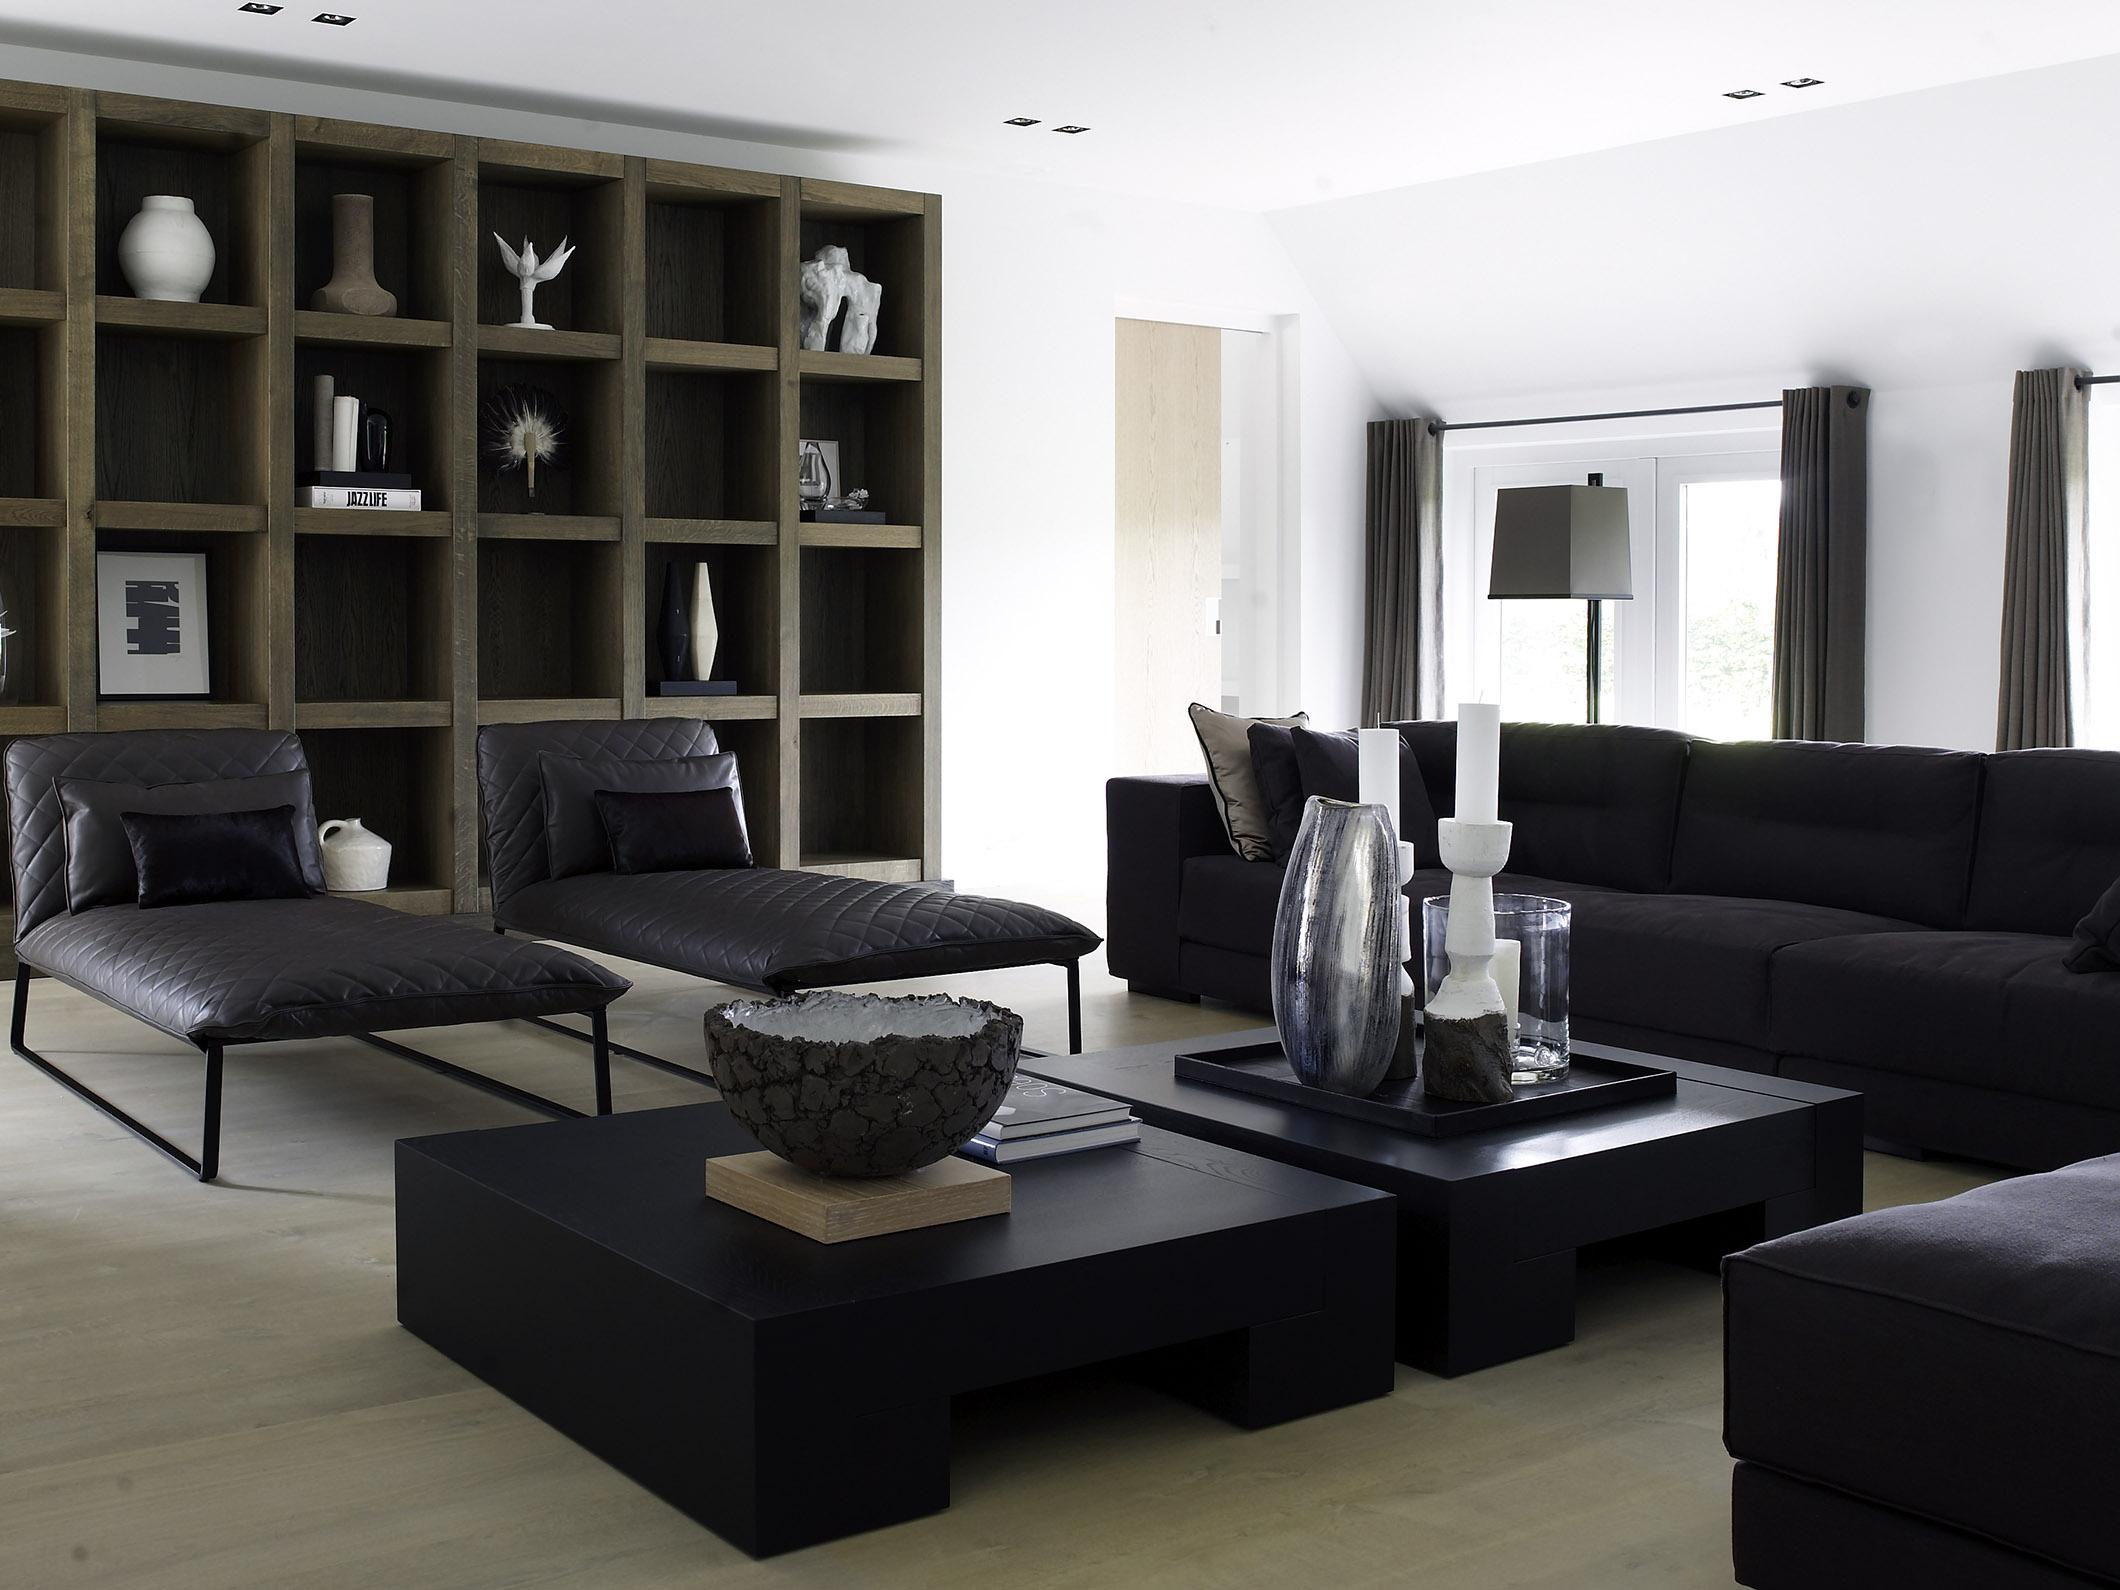 KEKKE longchair, DIEKE sofa and ITSKE and TOOS coffee table at Dutch farm house